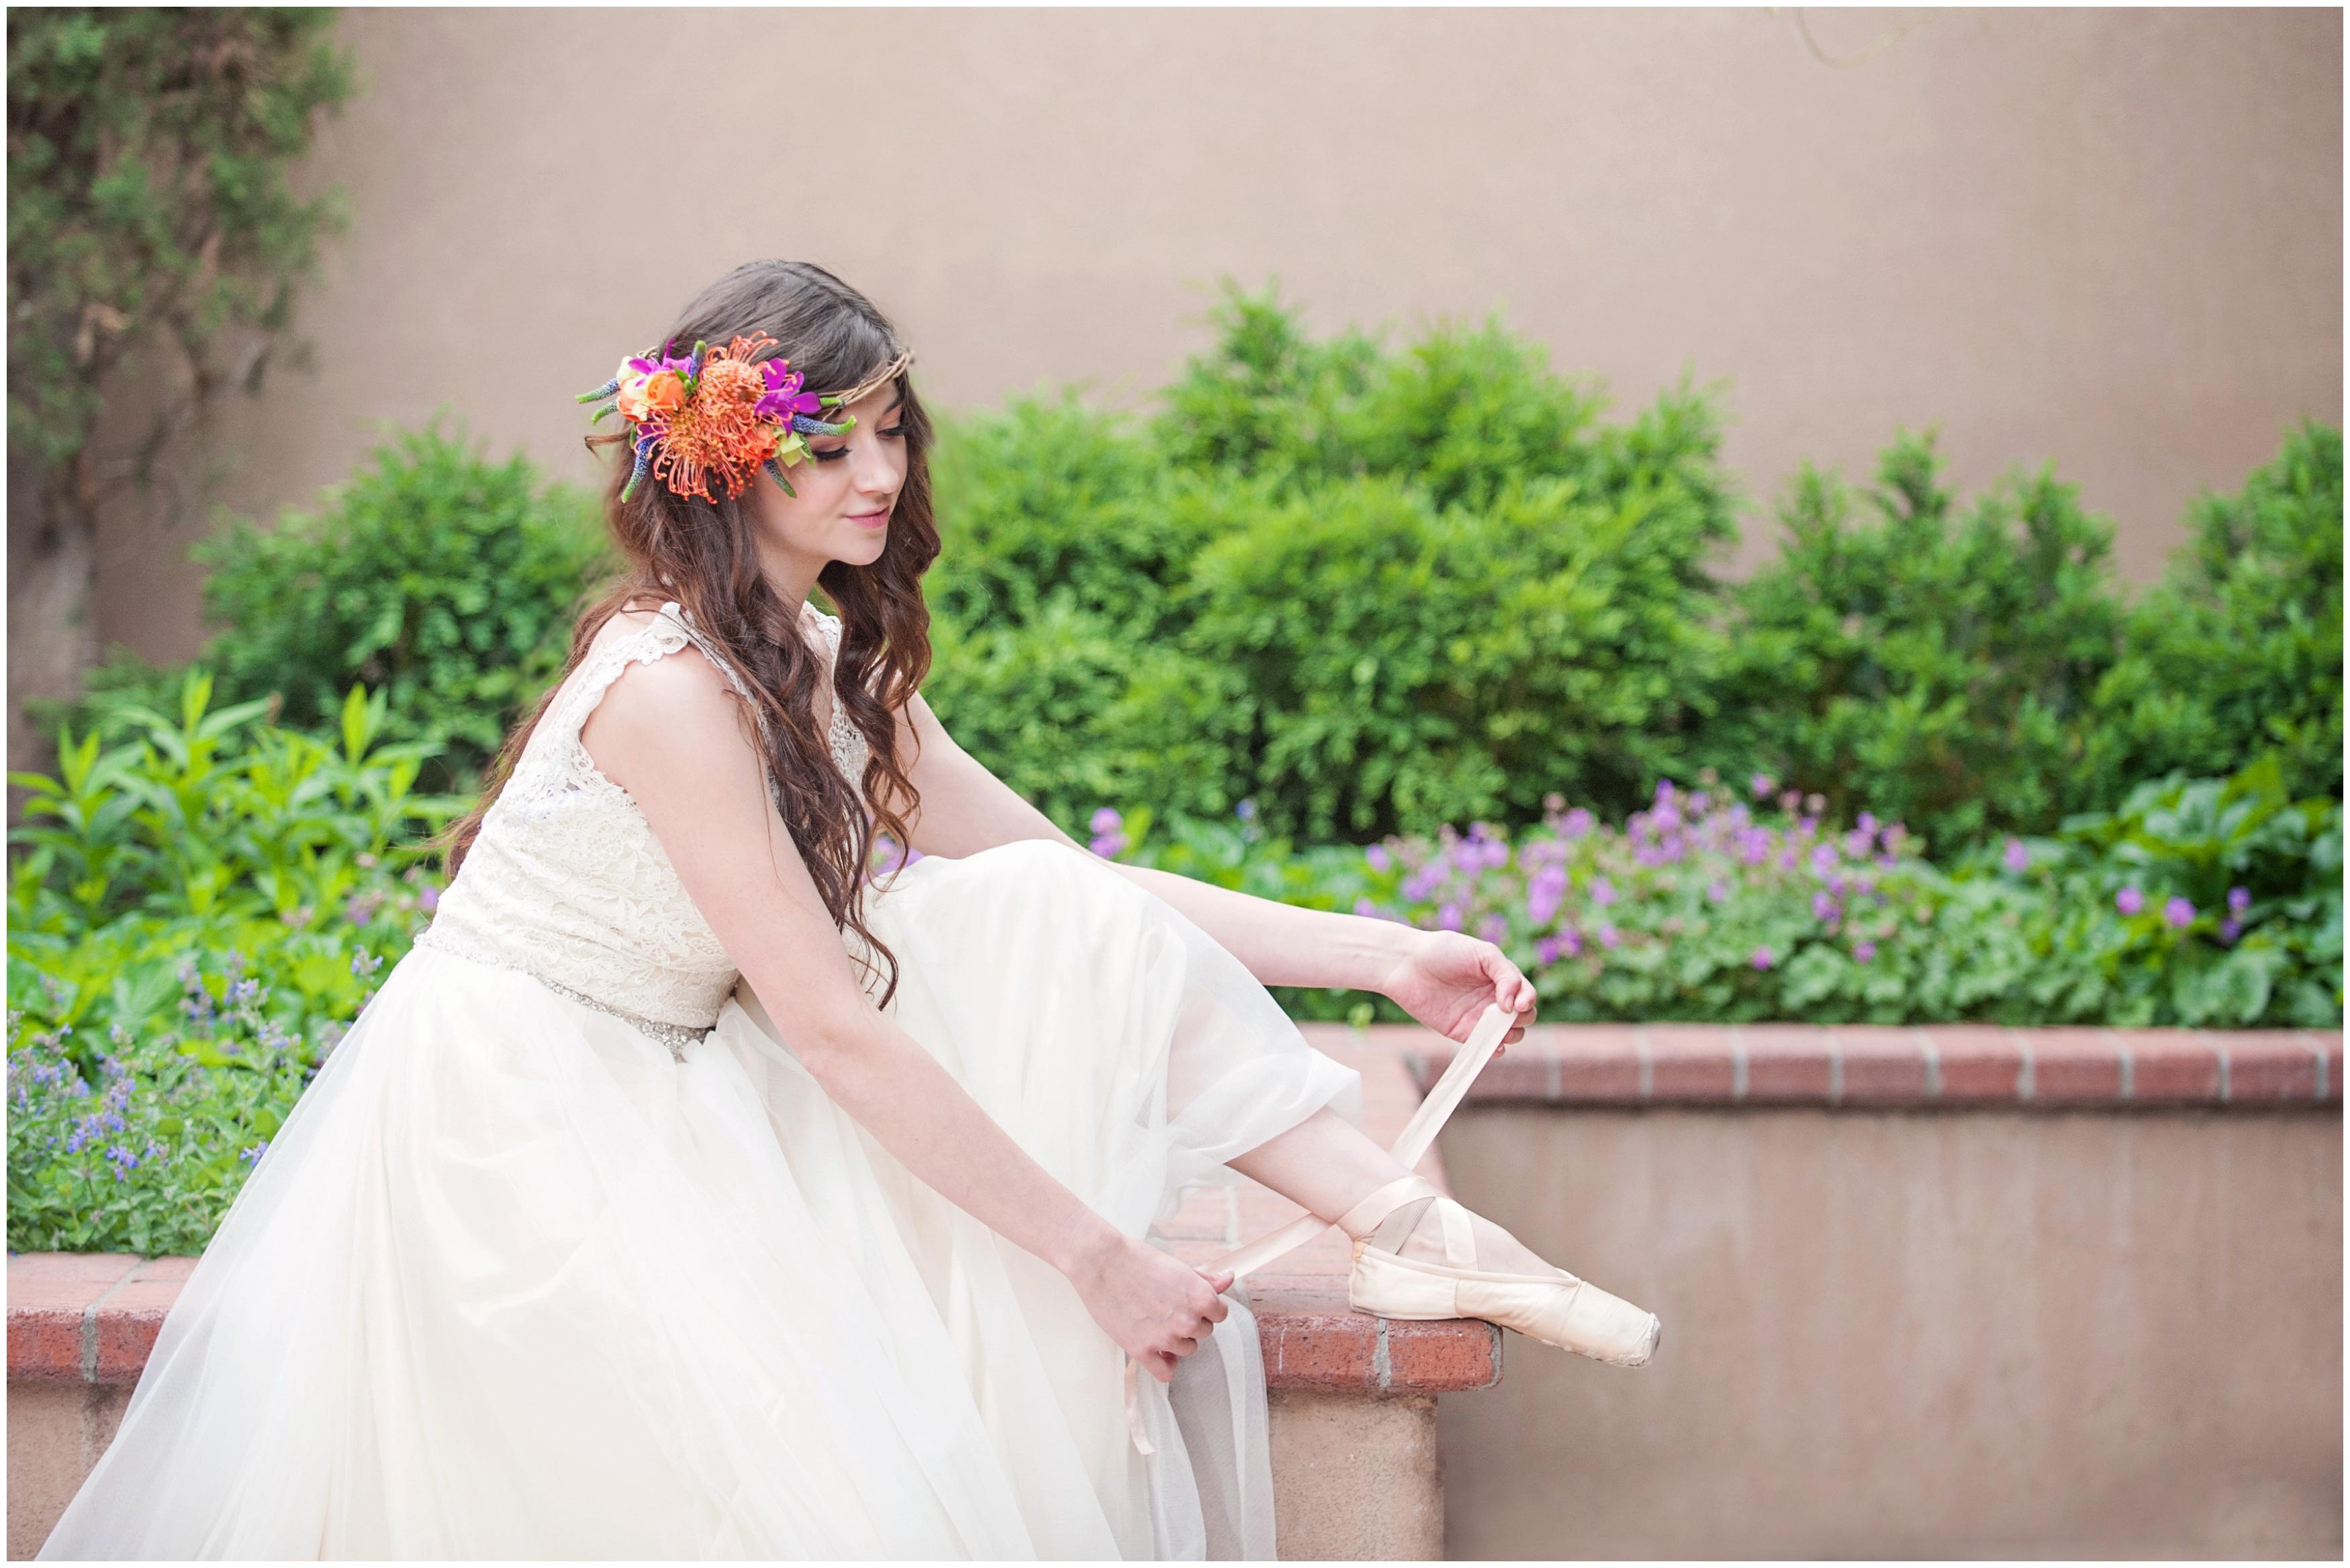 ballerina_brides_botanical_gardens_0013.jpg